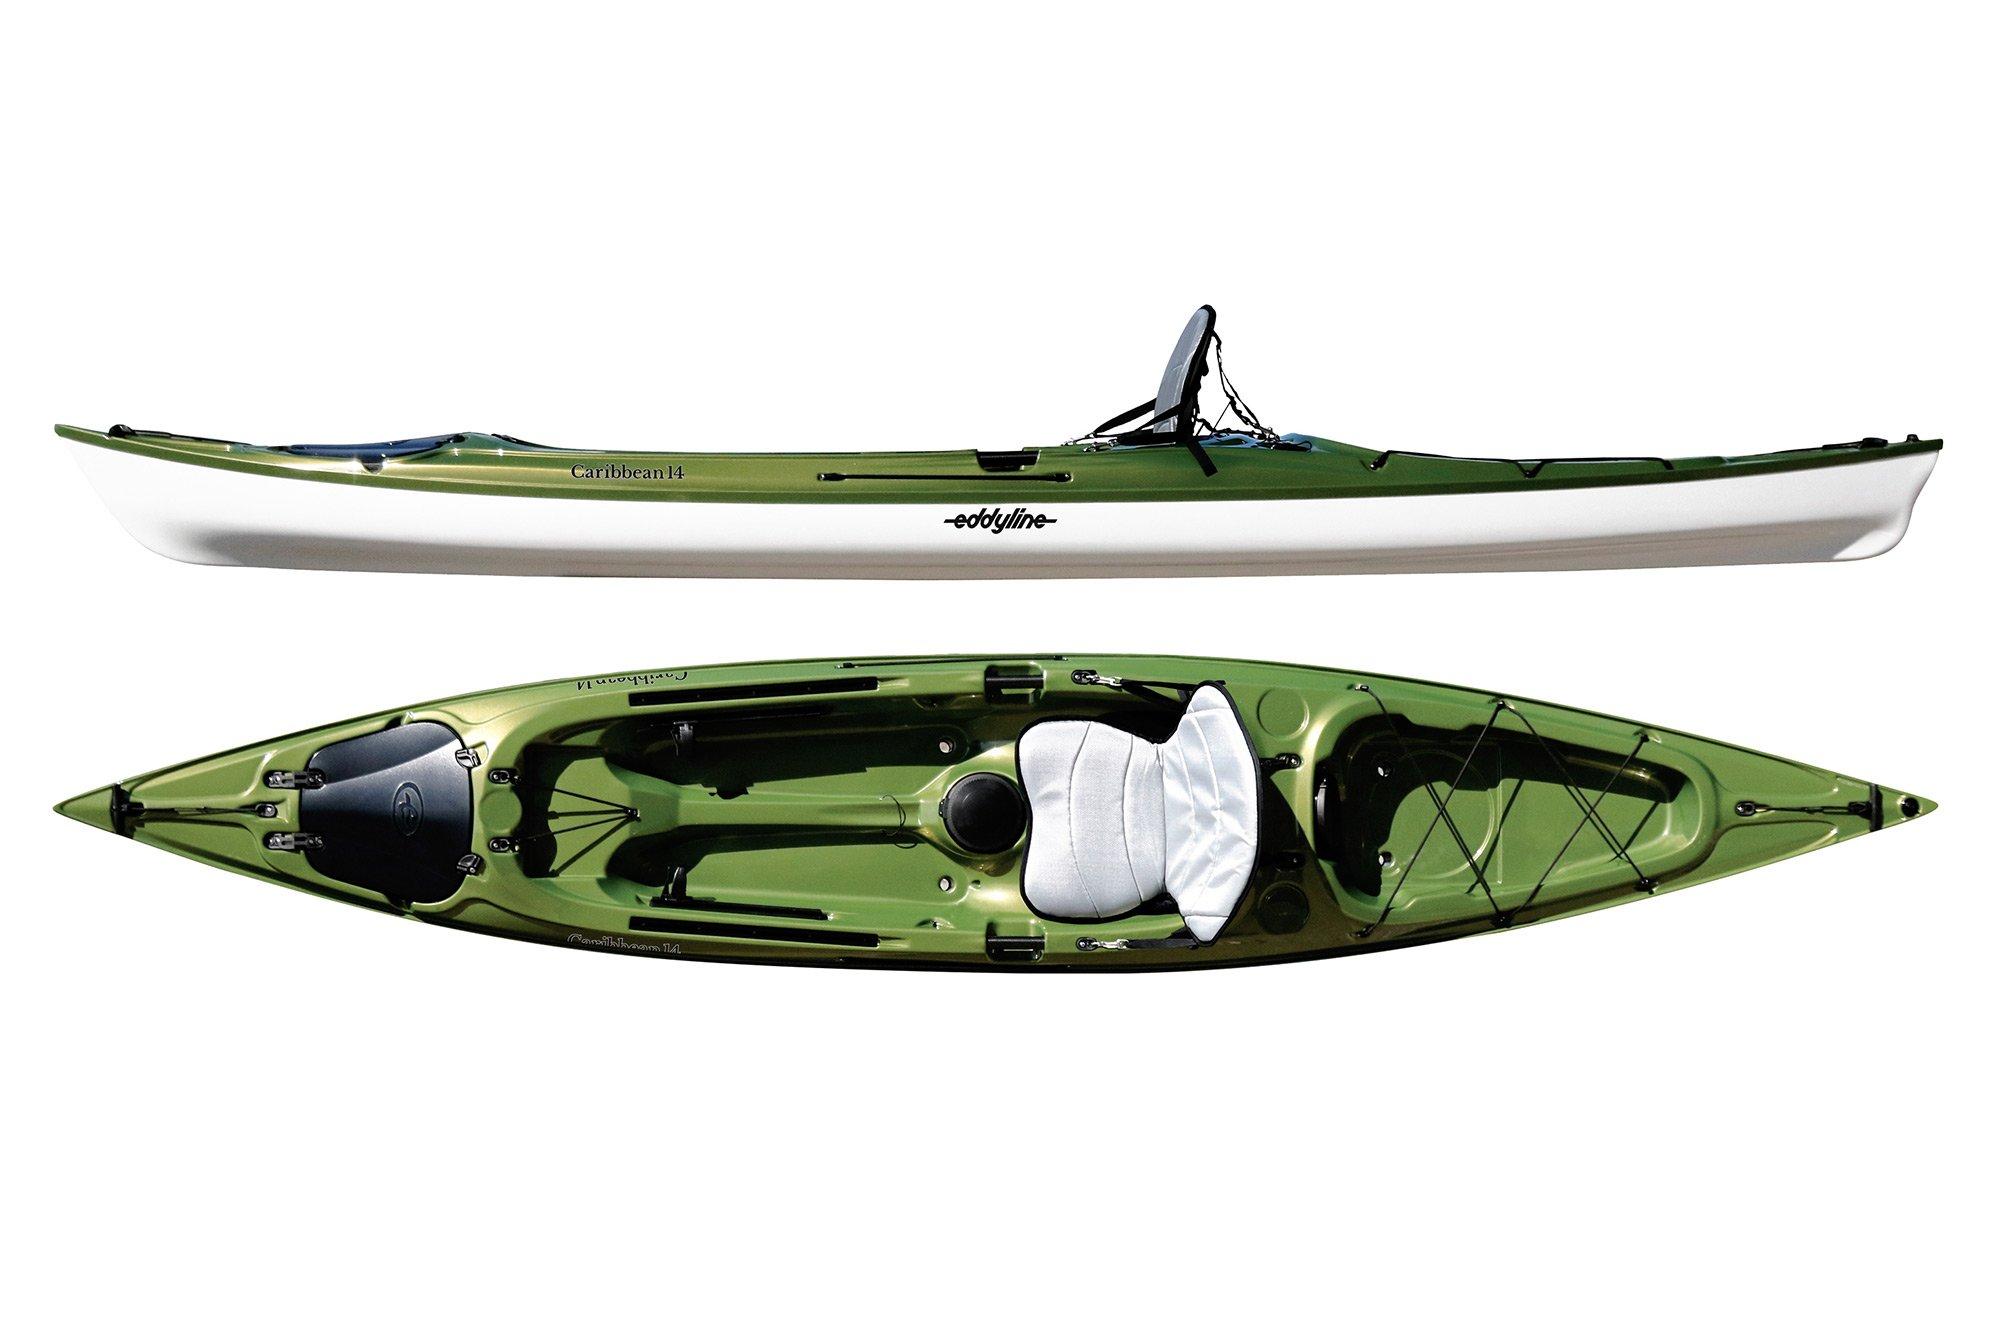 Eddyline Caribbean 14 Sit-On-Top Kayak - Seagrass / White